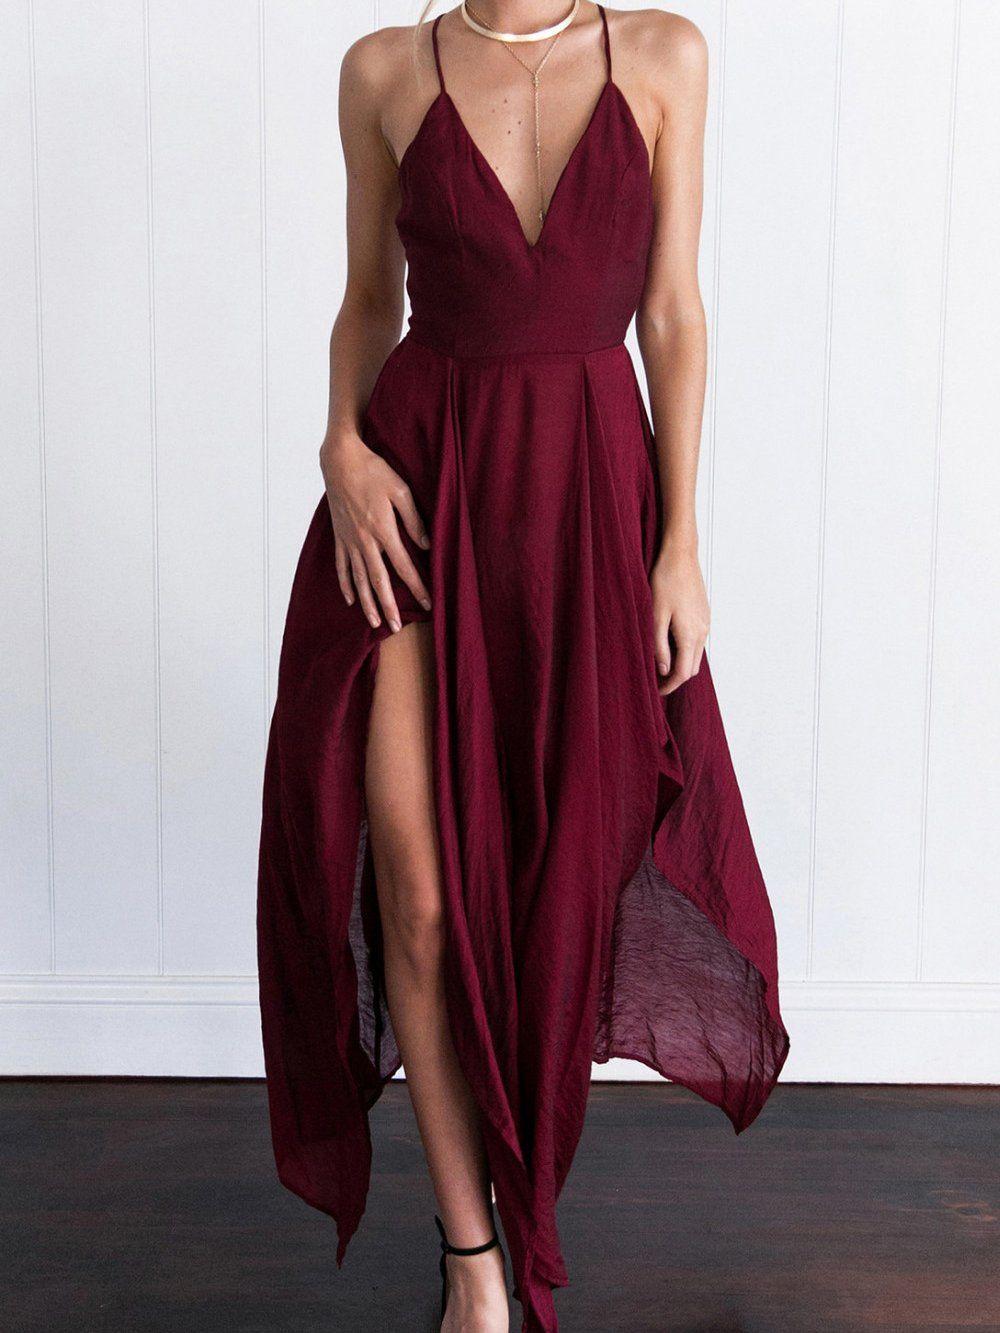 Sexy burgundy prom dresses halter asymmetrical long prom dress